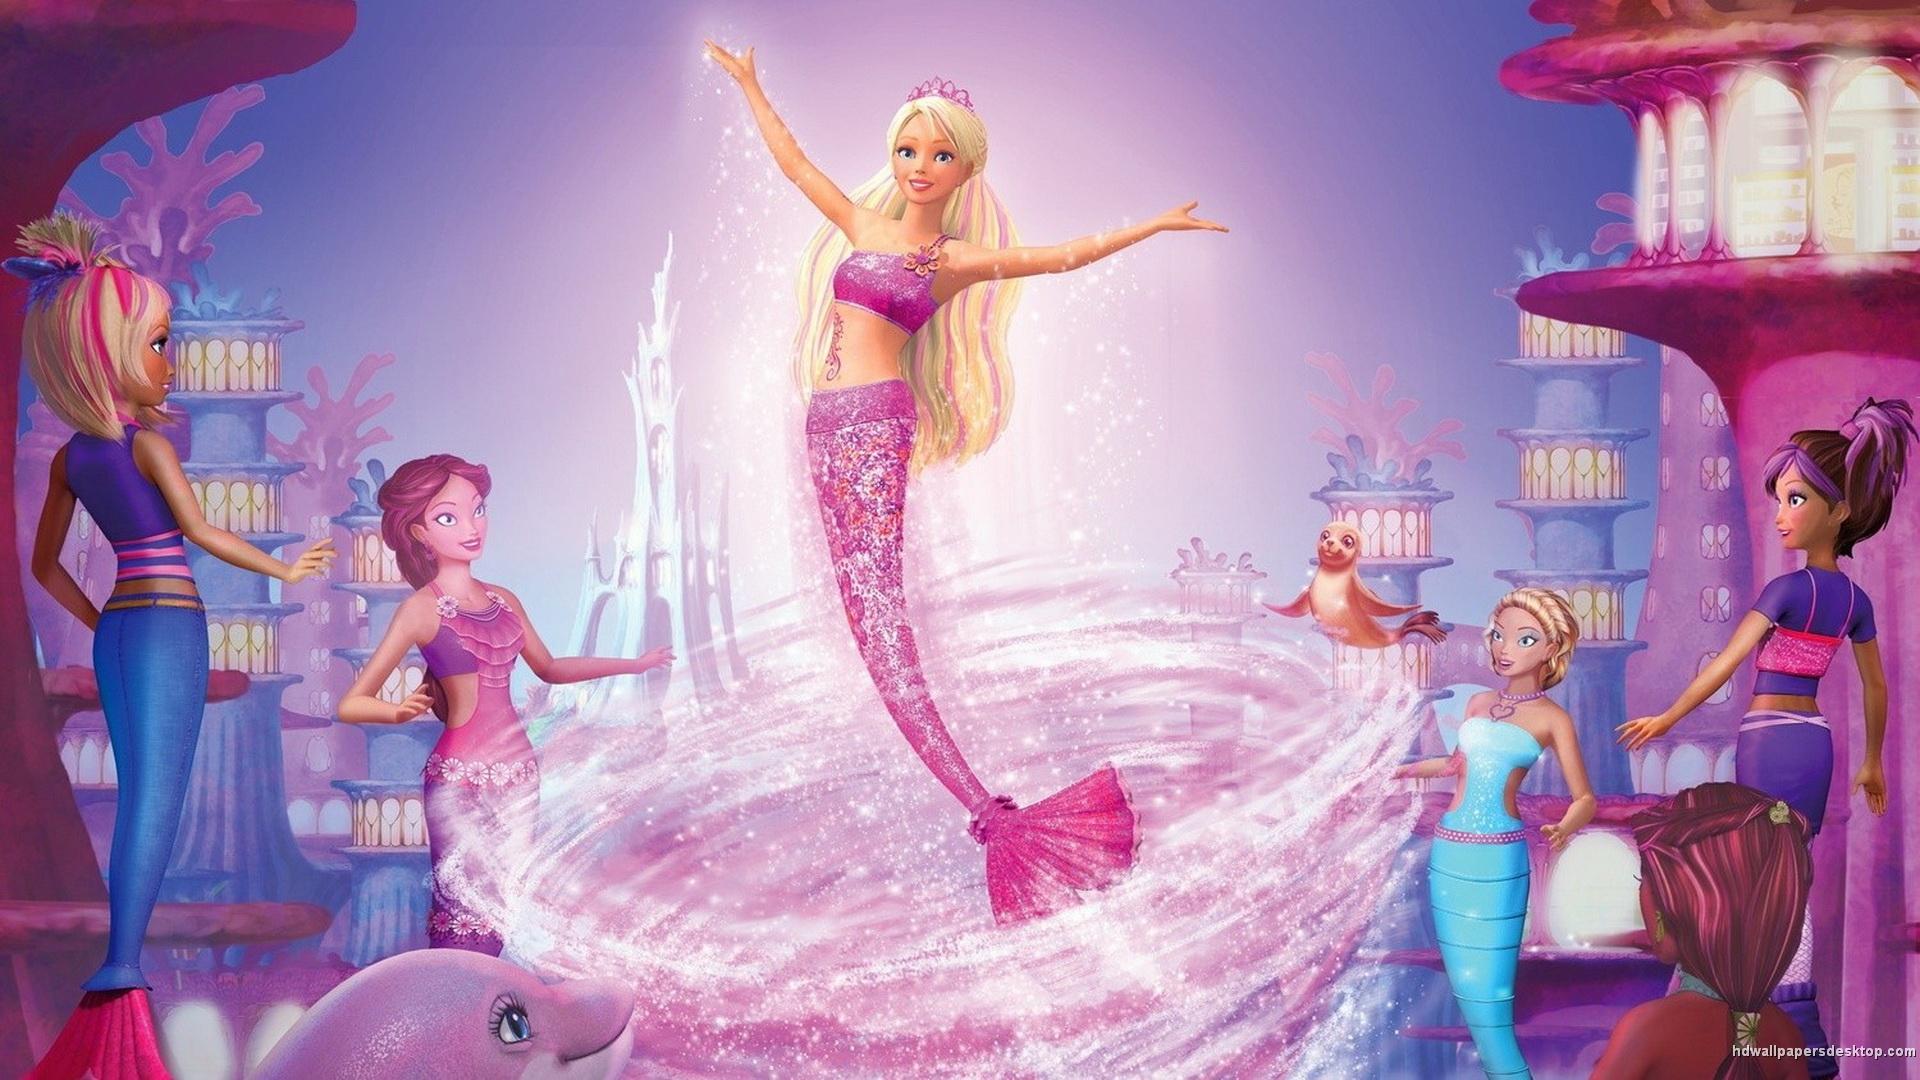 Barbie Wallpaper Barbie Wallpaper Desktop Barbie Magic Pegasus 1920x1080